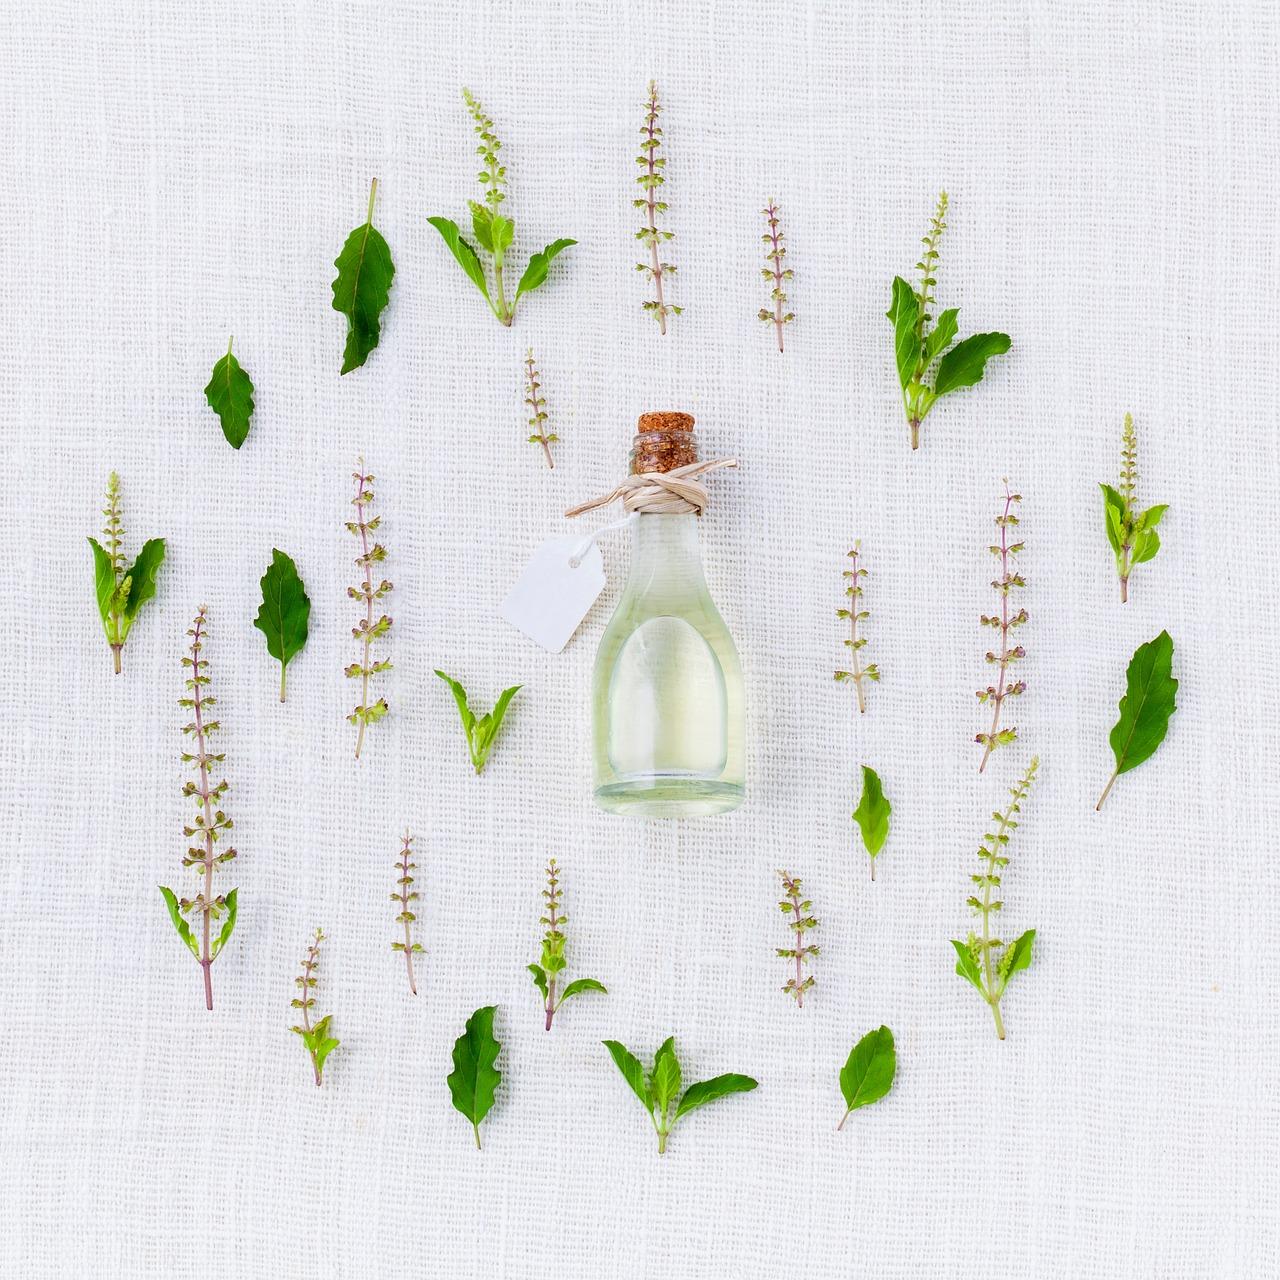 ulei menta - armomaterapie - sfatulparintilor.ro - pixabay_com